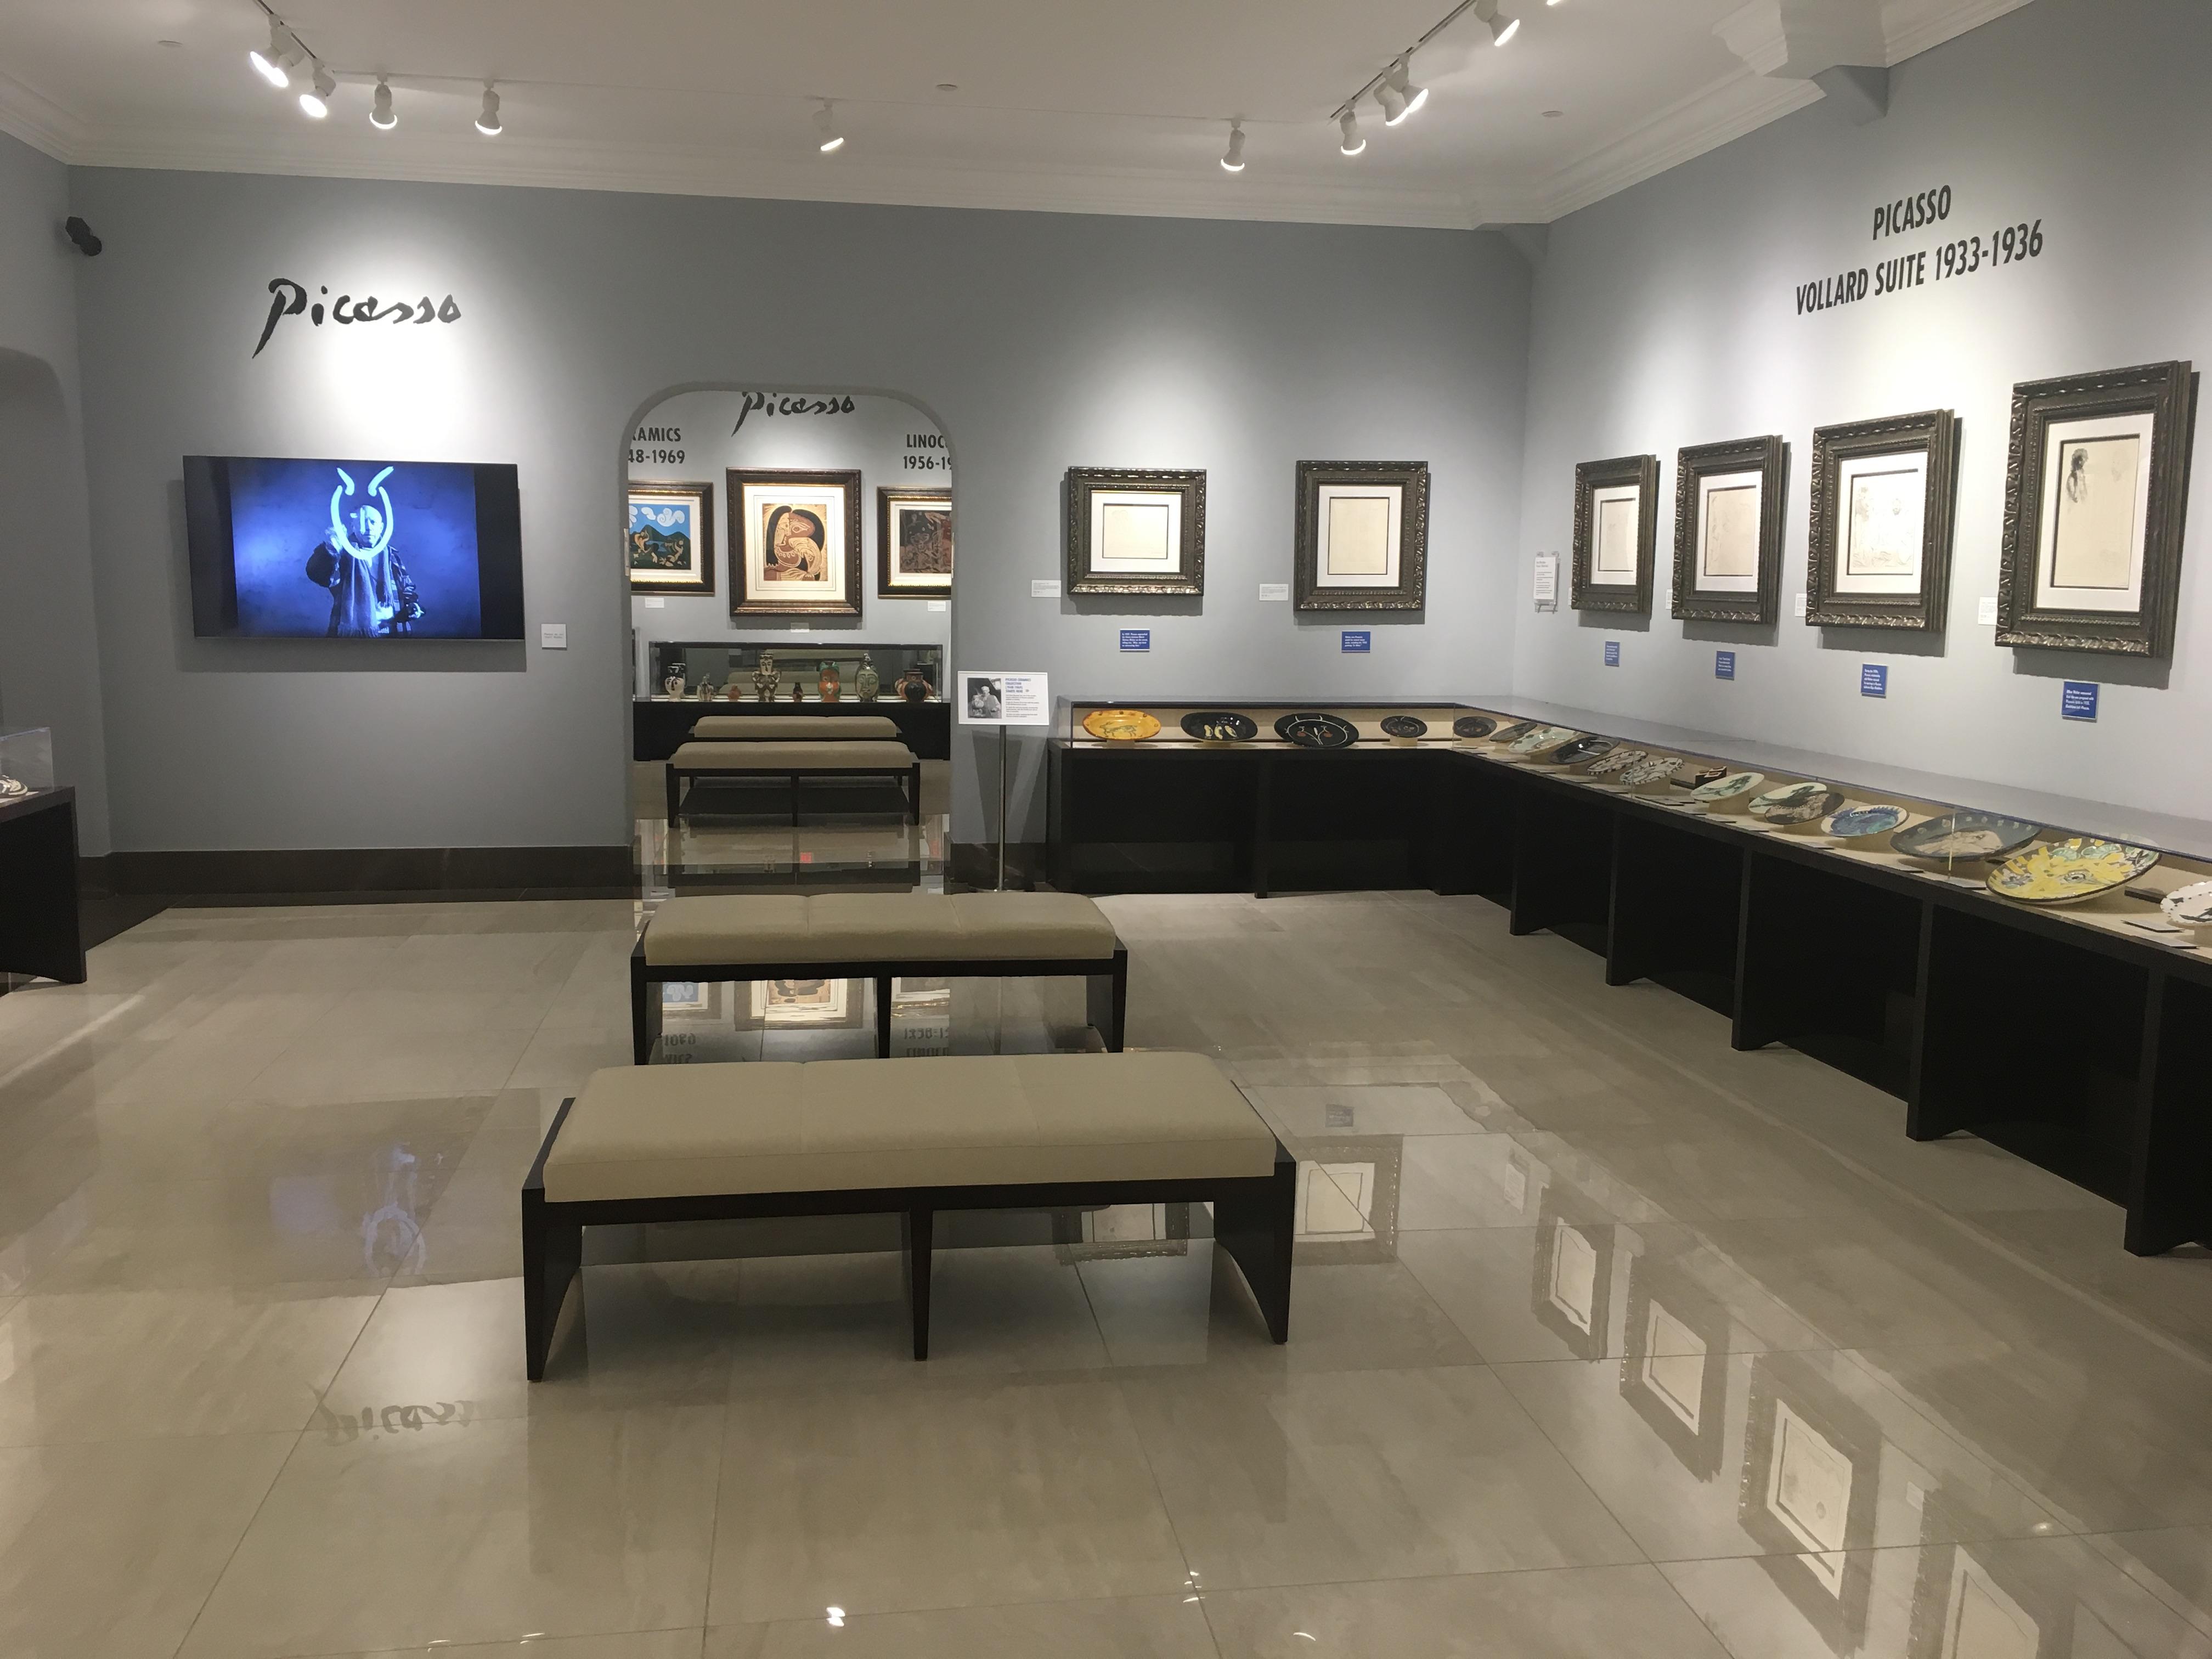 The Vollard Suite gallery at Park West Museum.